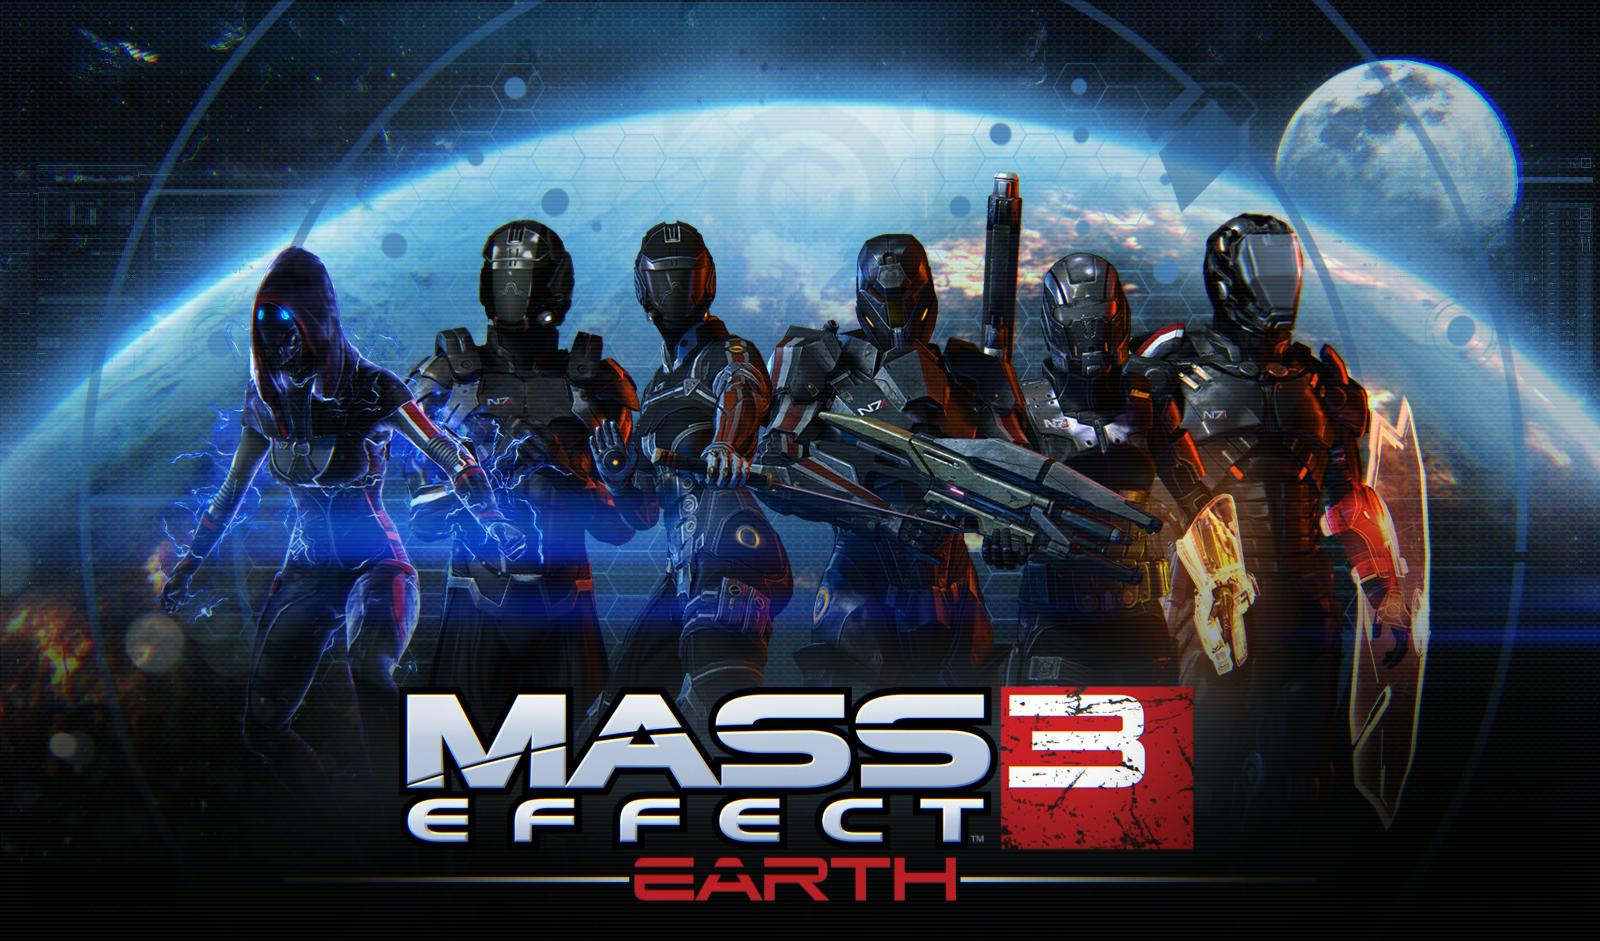 Pc mass effect 3 savegame 100% game save download file.